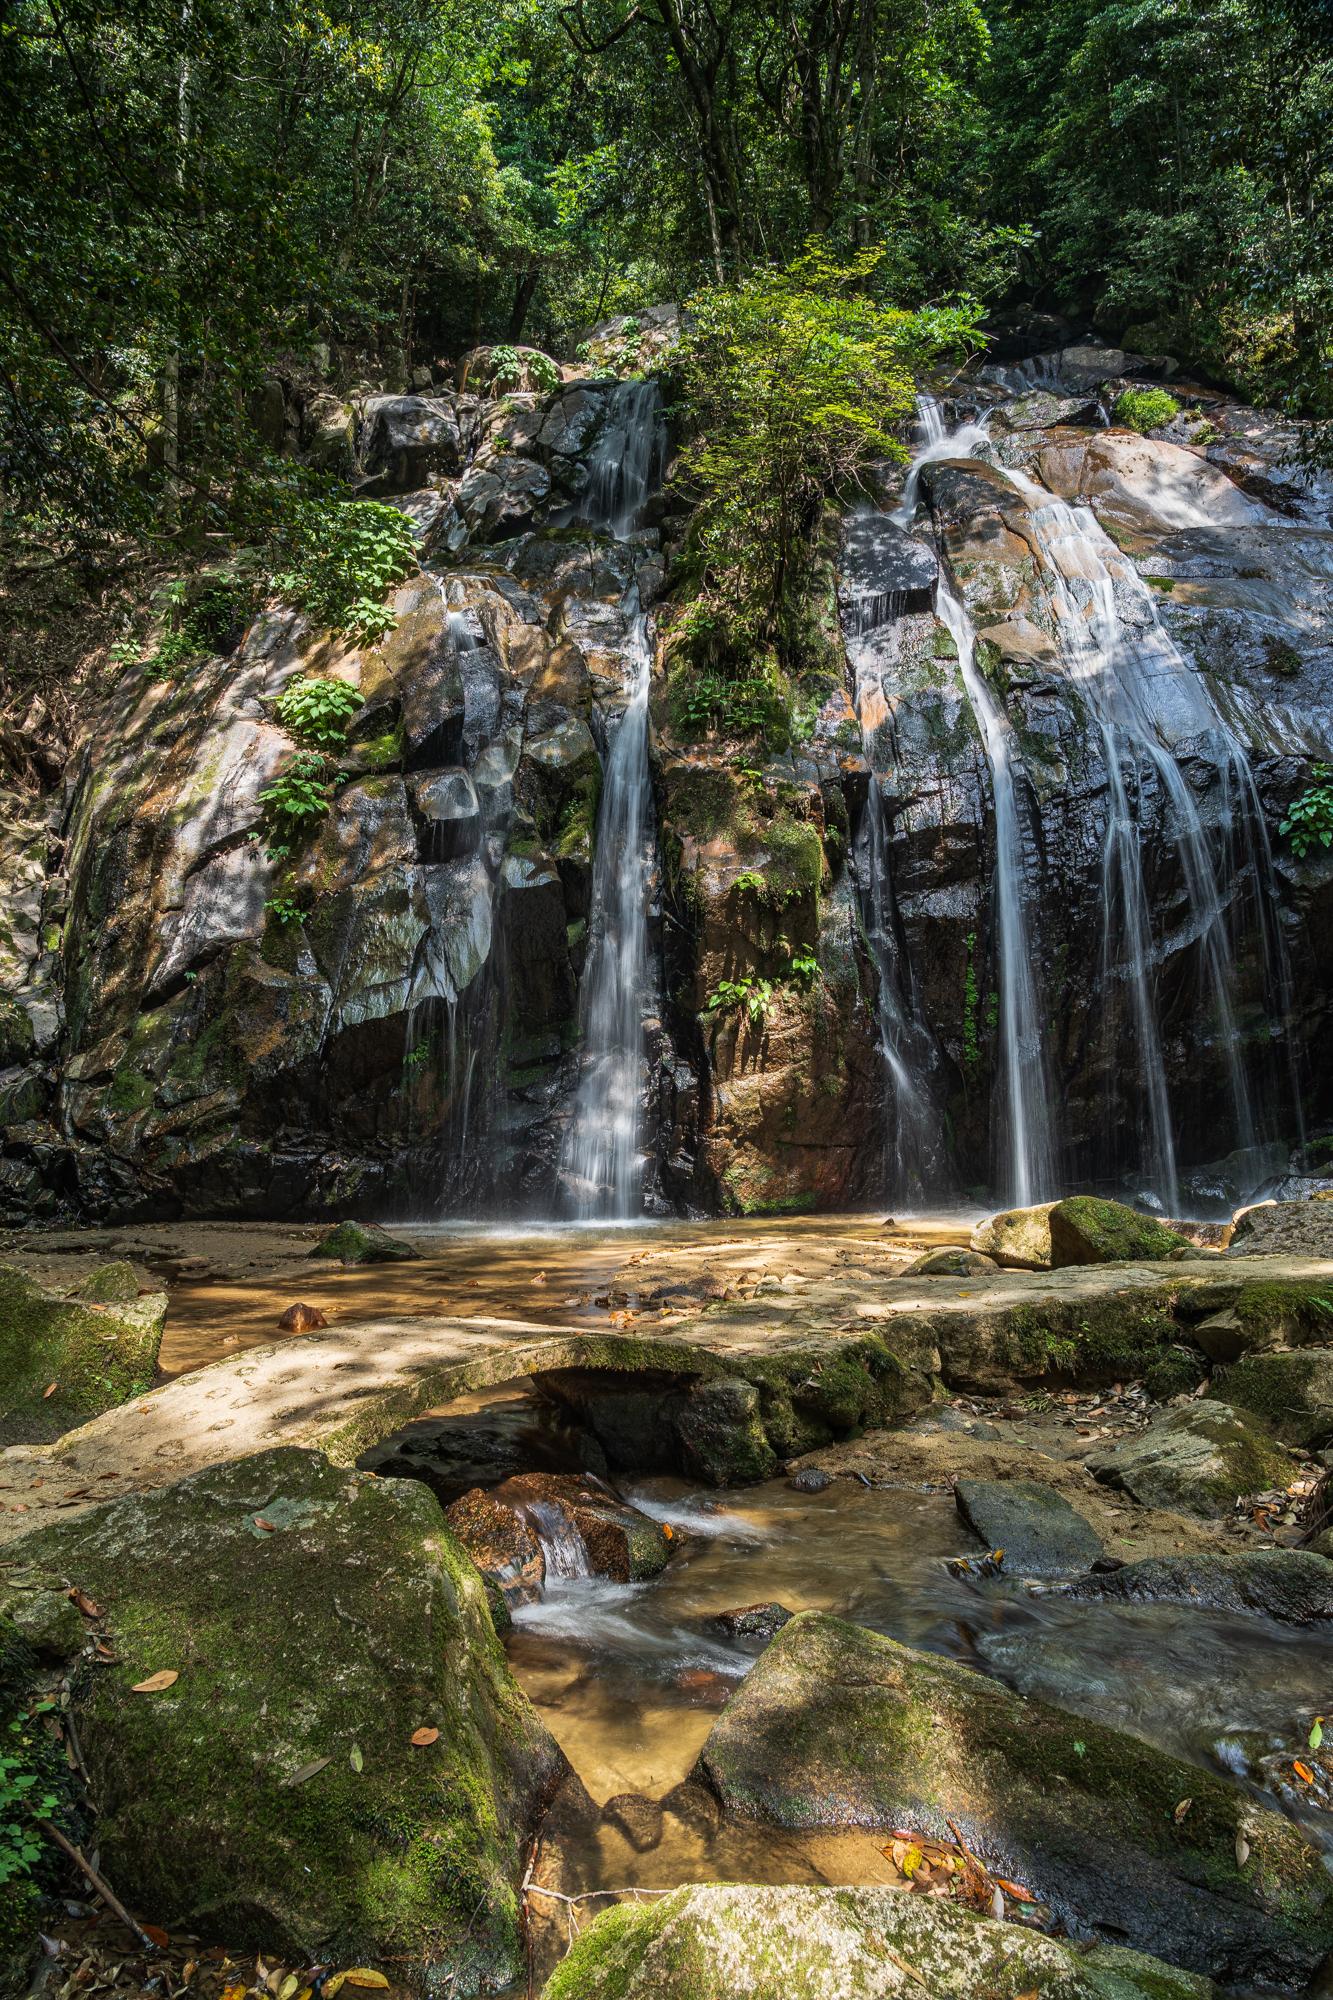 DSC04561-Edit-1 京都  金引の滝 ( 京都の夏、新緑の時期におすすめの滝写真スポット・アクセス情報や撮影ポイントなど!)